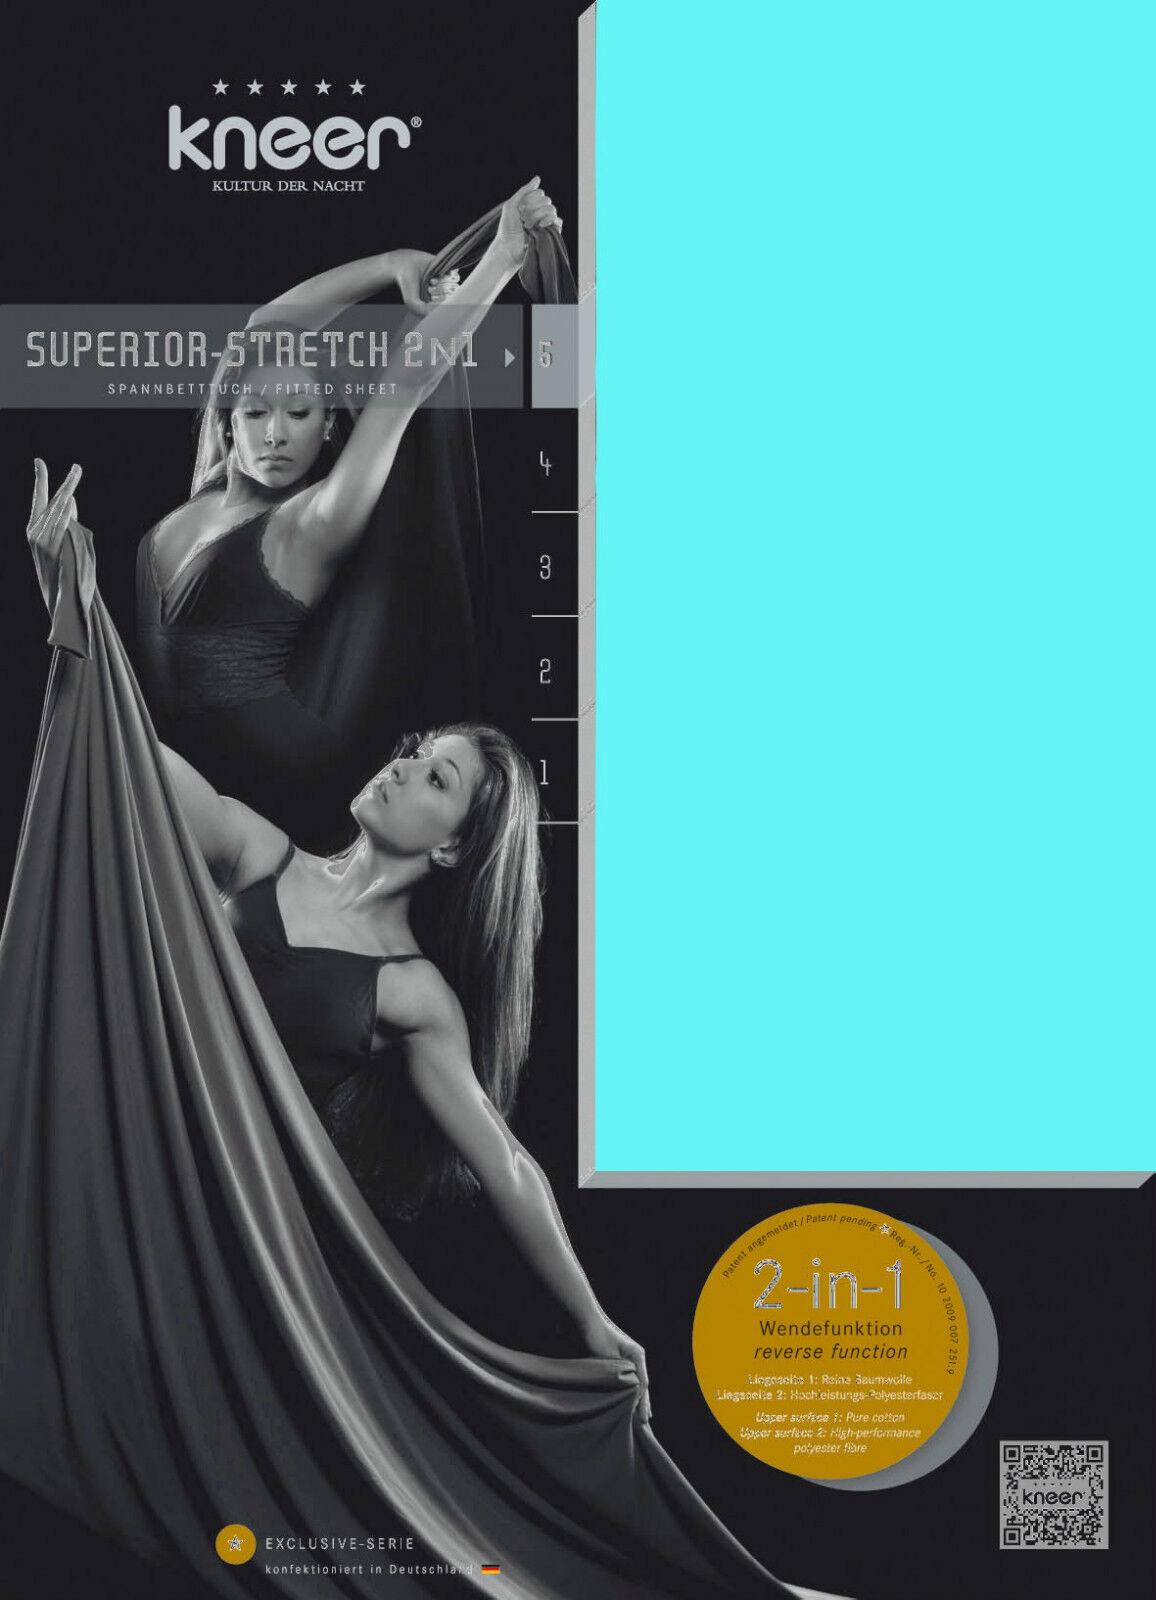 REVERSIBLE Sábana 120x200-130x220 ajustable superior-stretch 2n1 120x200-130x220 Sábana Kneer Q98 6ddf53